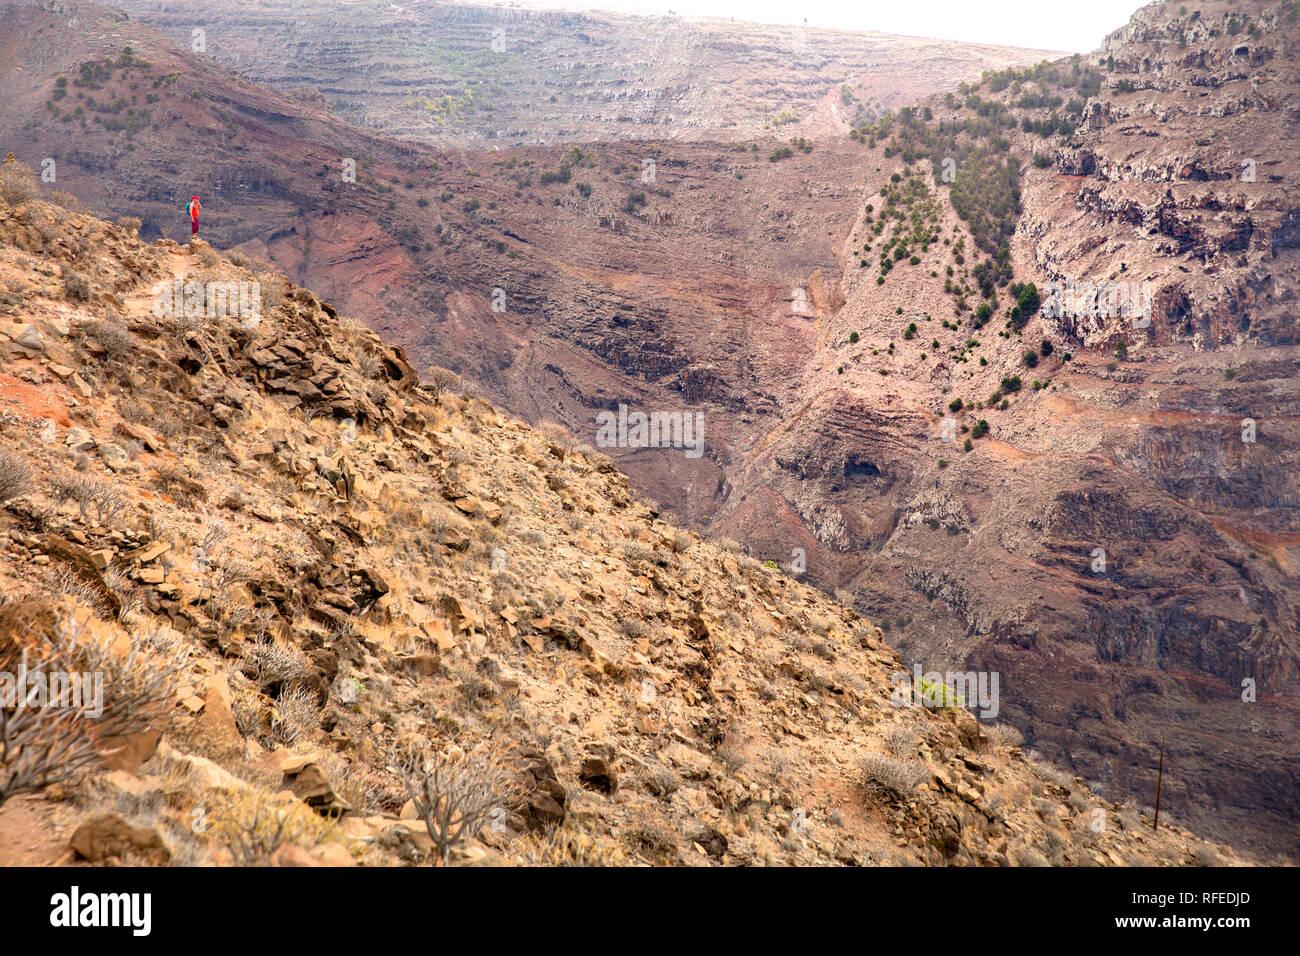 Espagne, Canaries, La Gomera. Valle Gran Rey. Randonneur en montagne. Banque D'Images